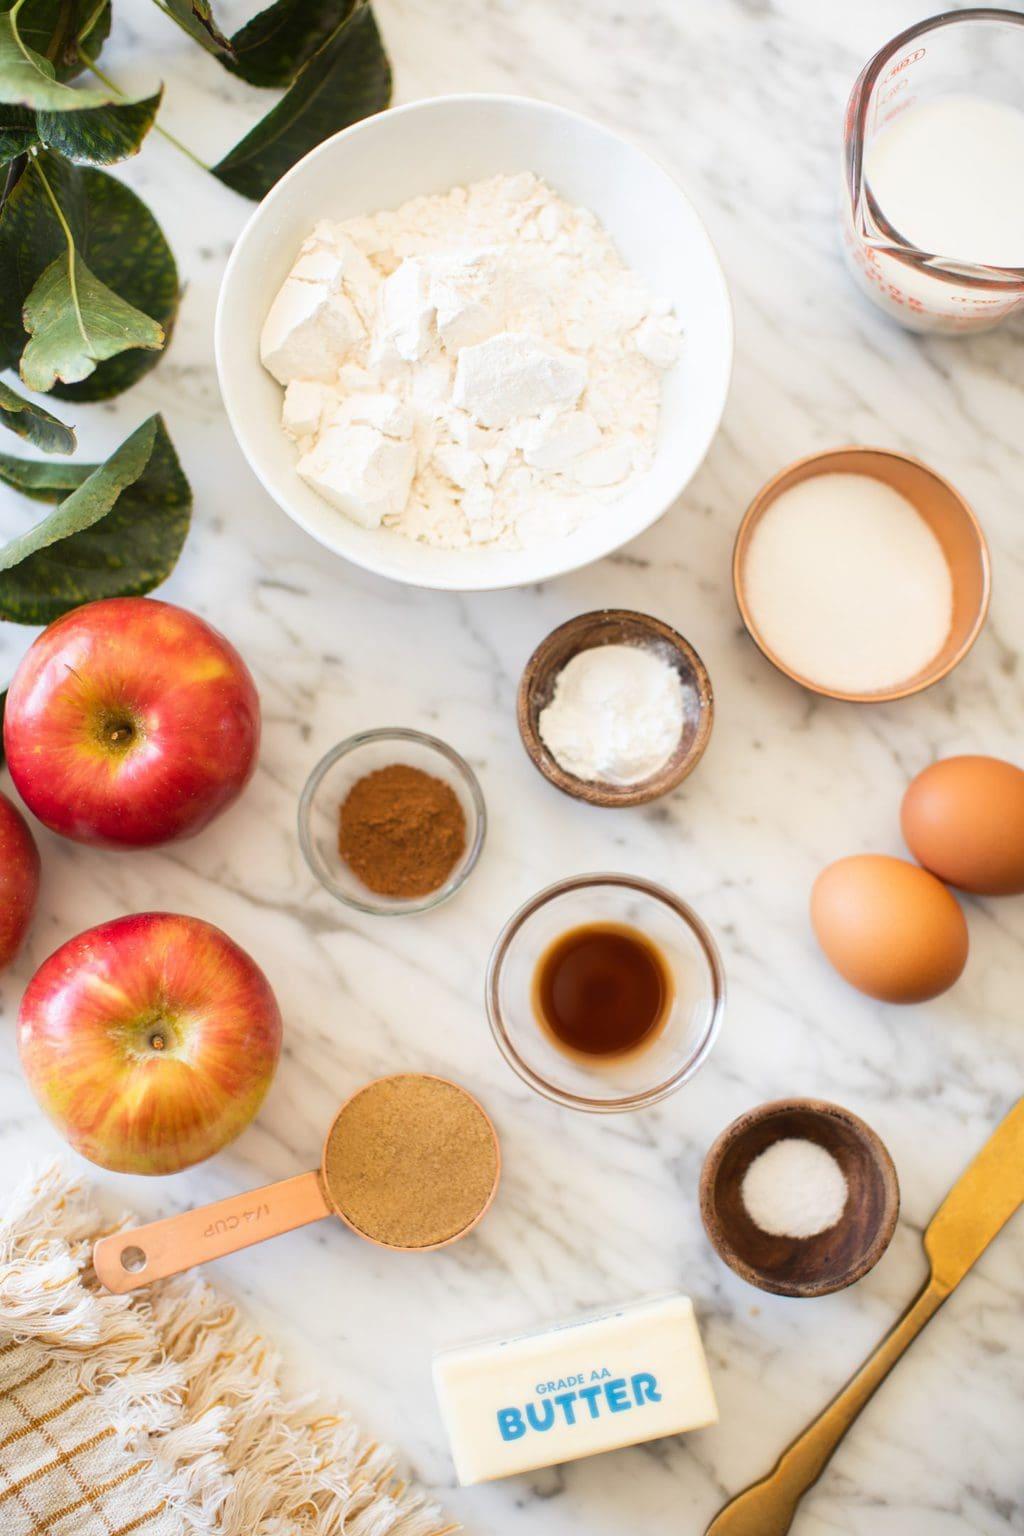 flour, sugar, eggs, cinnamon, vanilla, apples, brown sugar